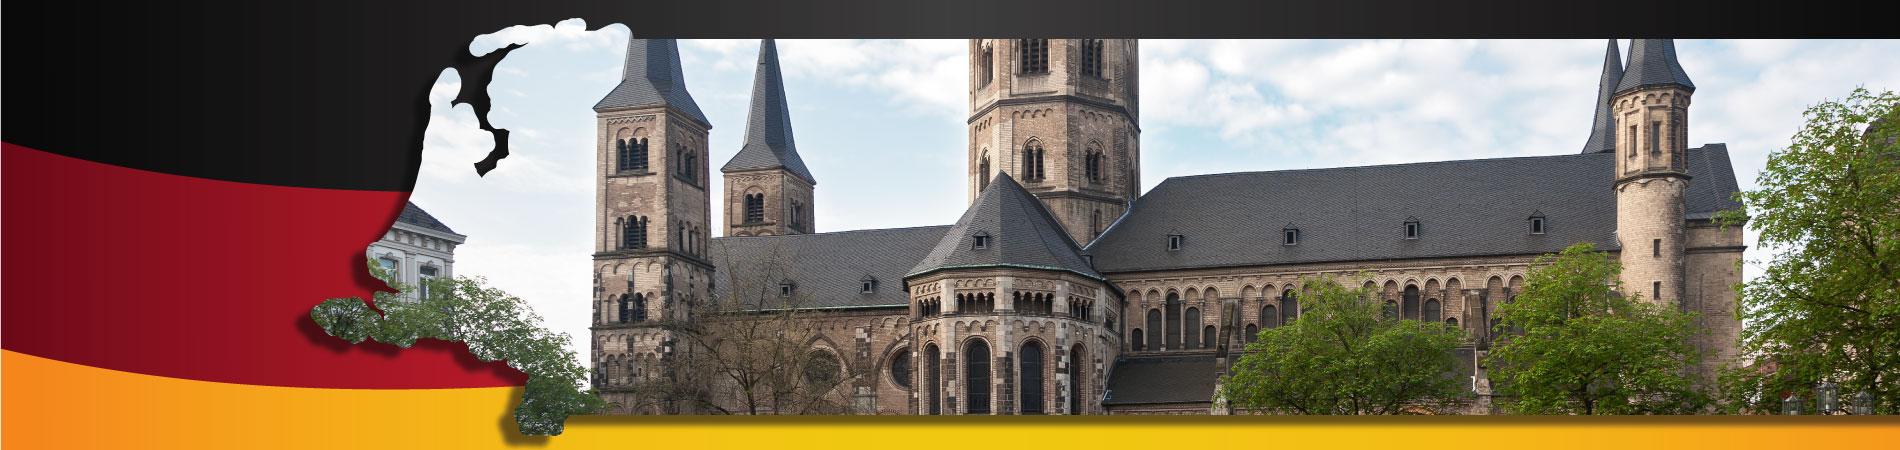 Bonn Dom tour